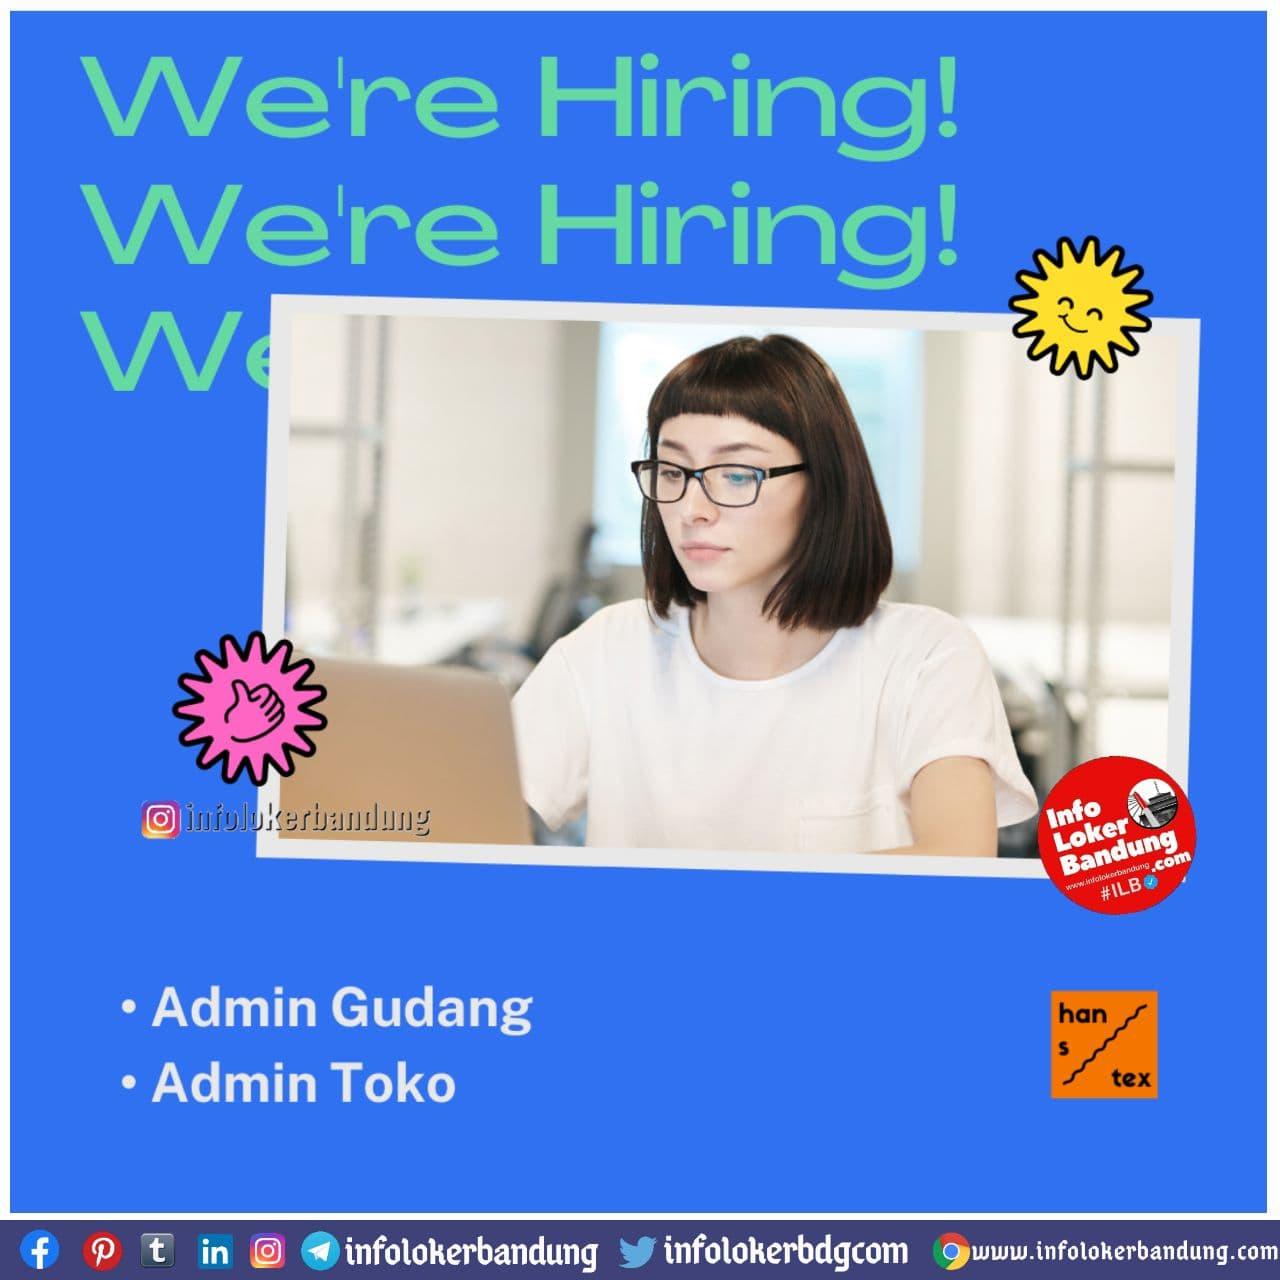 Lowongan Kerja Hanstex Bandung Januari 2021